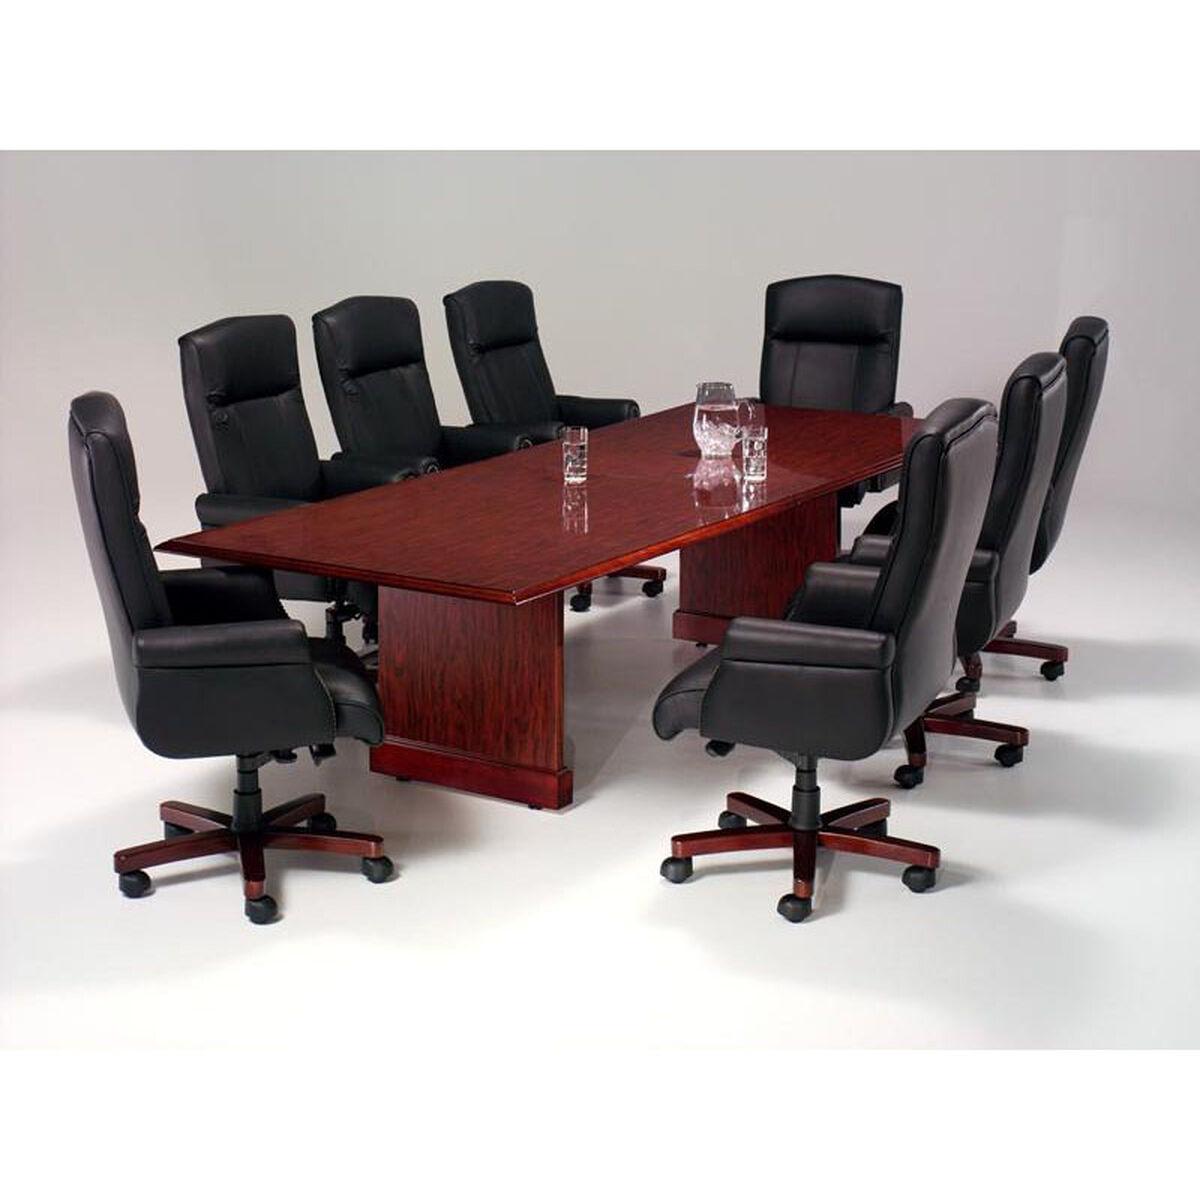 Rectangular Conference Table Bizchaircom - Rectangular conference room table